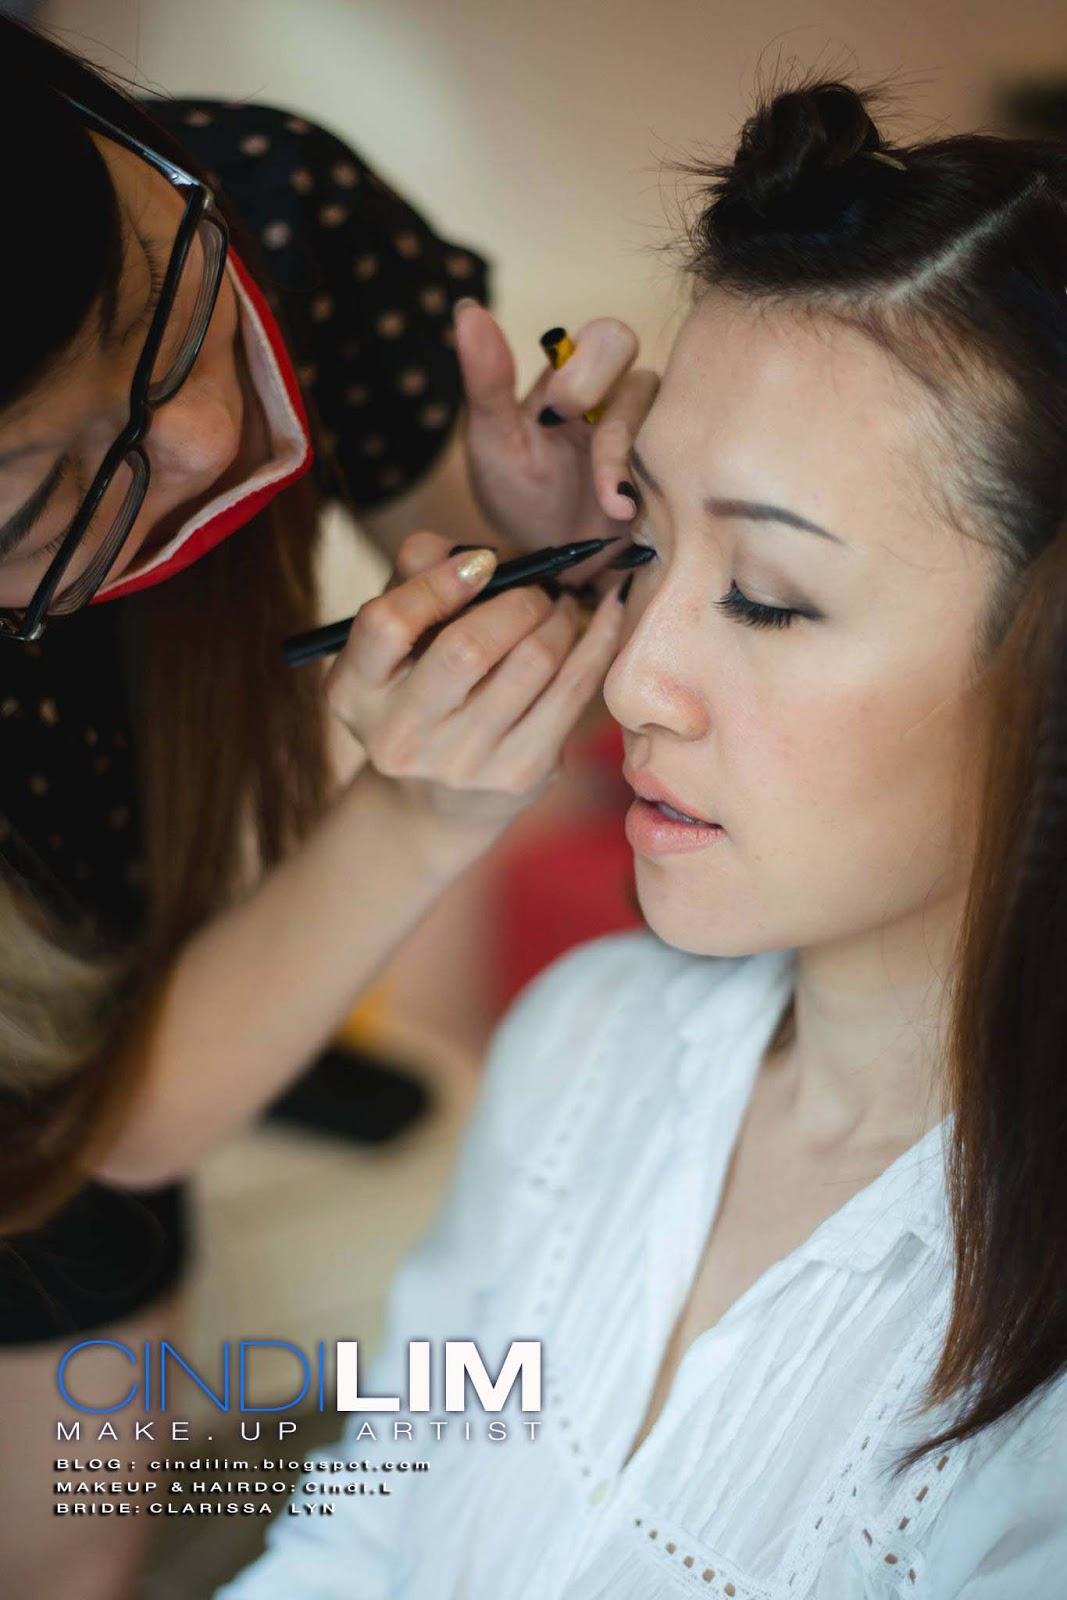 Cindi Pro Makeup Artist Commercial Photoshoot Makeup: :: Cindi Pro. Makeup Artist ::: AD MAKEUP & HAIRDO (Calyssa.L